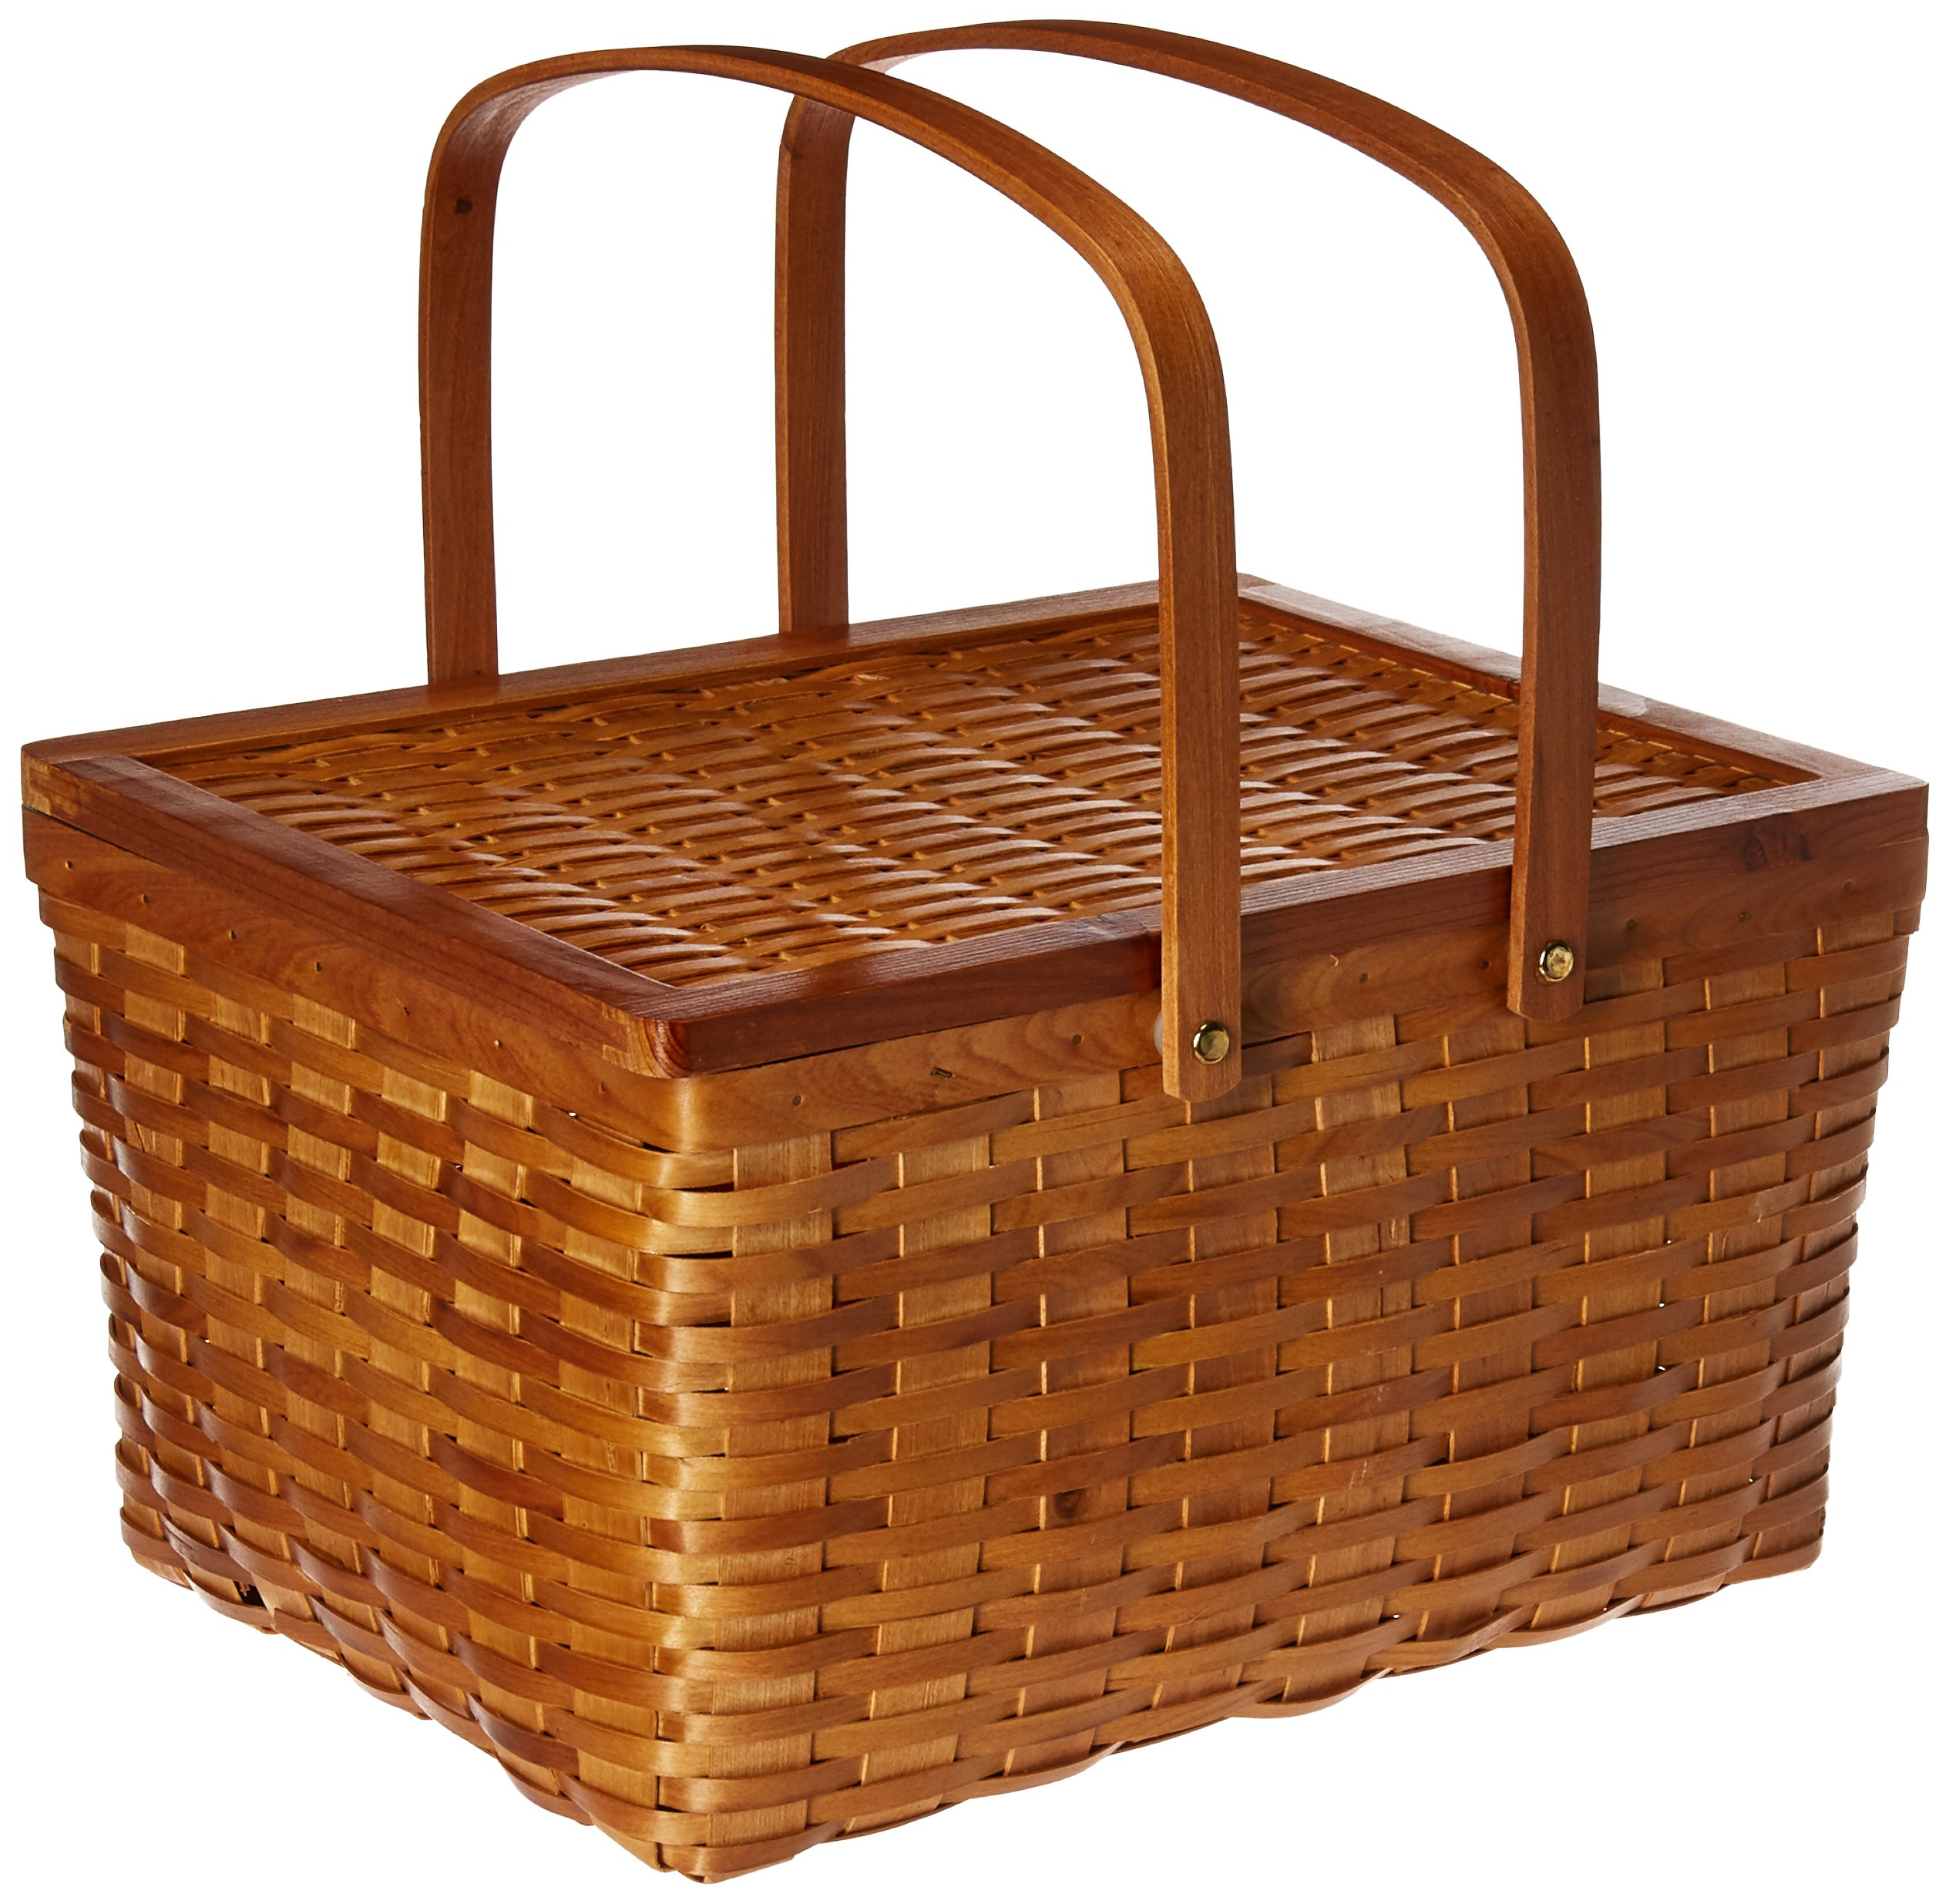 Vintiquewise(TM) Rectangle Handwoven Chipwood Basket by Vintiquewise